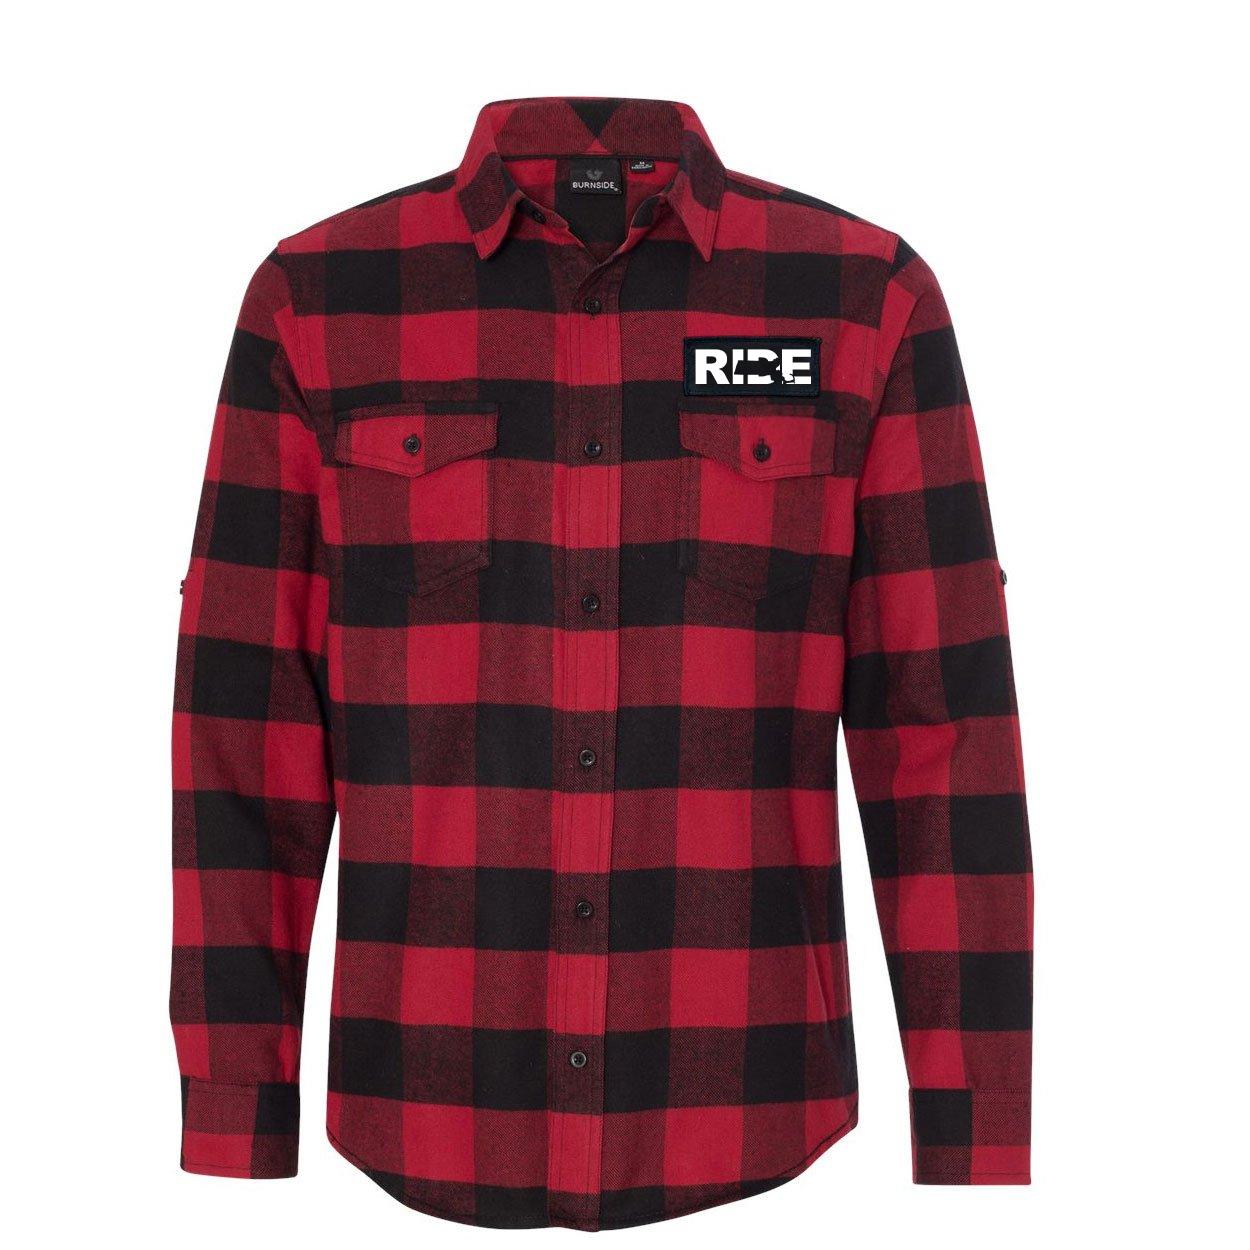 Ride Massachusetts Classic Unisex Long Sleeve Woven Patch Flannel Shirt Red/Black Buffalo (White Logo)